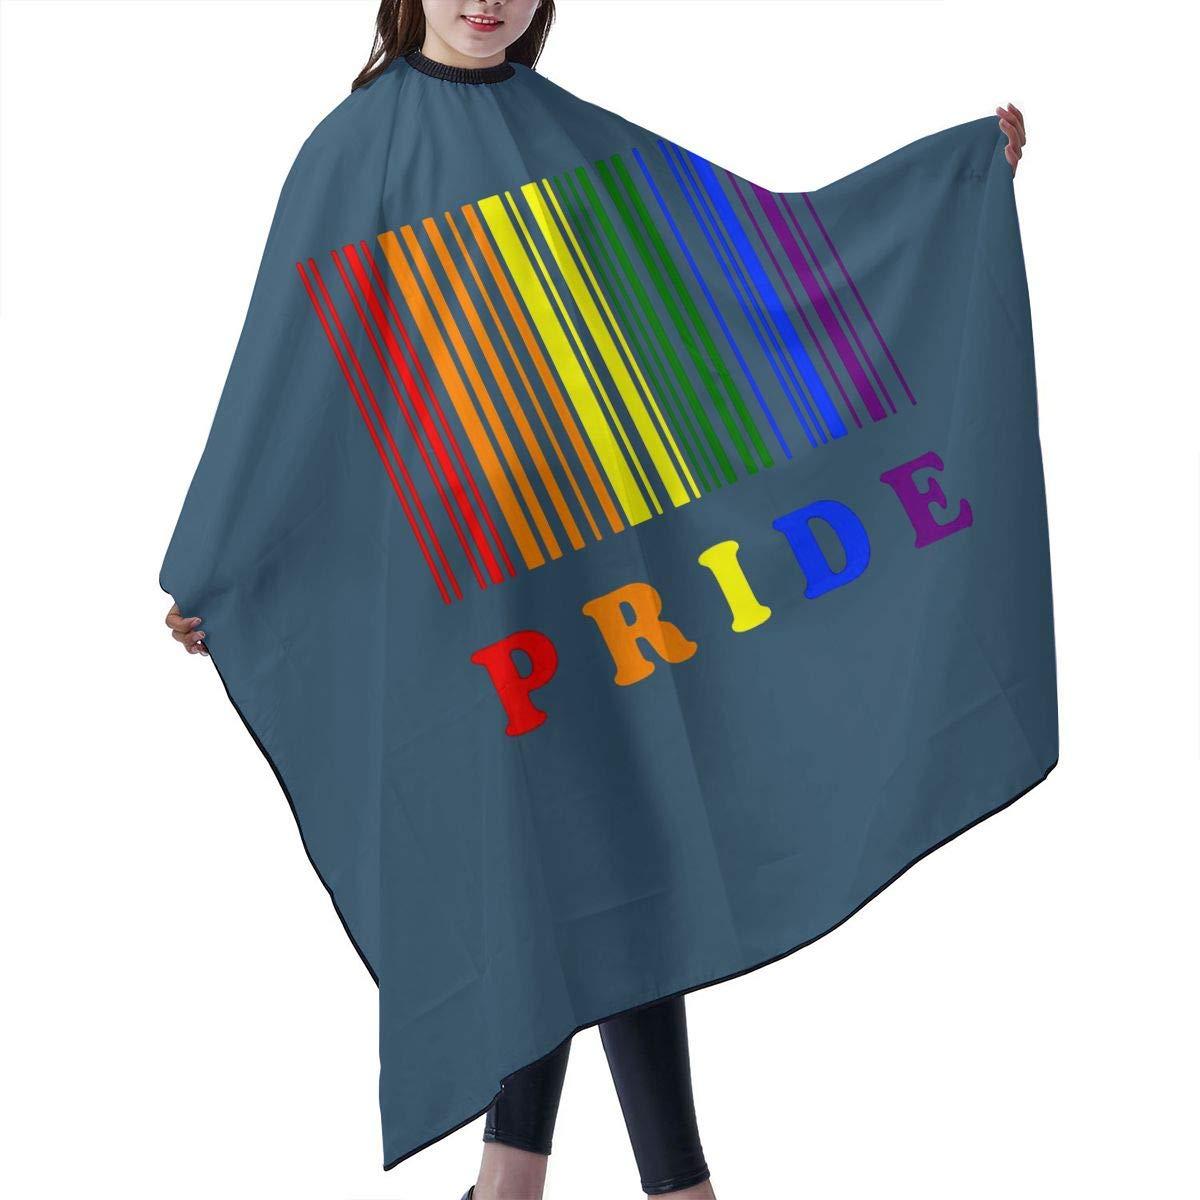 wholesale Lgbt Pride Barcode Manufacturer OFFicial shop Barber Cape Salon Cover Professional Cloak Ha